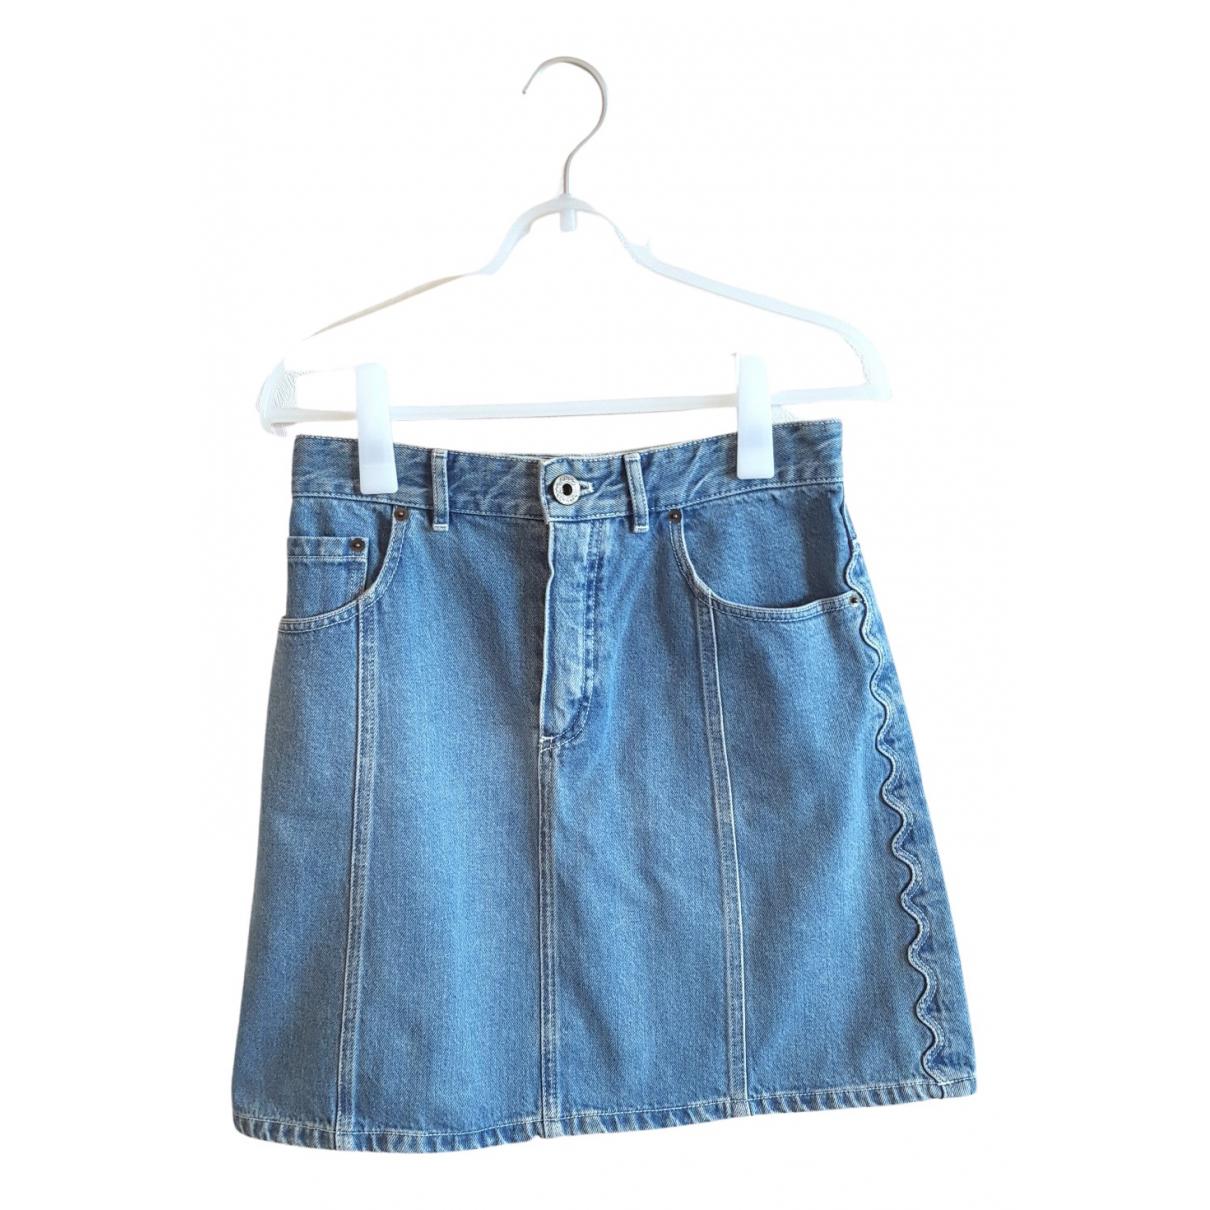 Chloe - Jupe   pour femme en denim - bleu